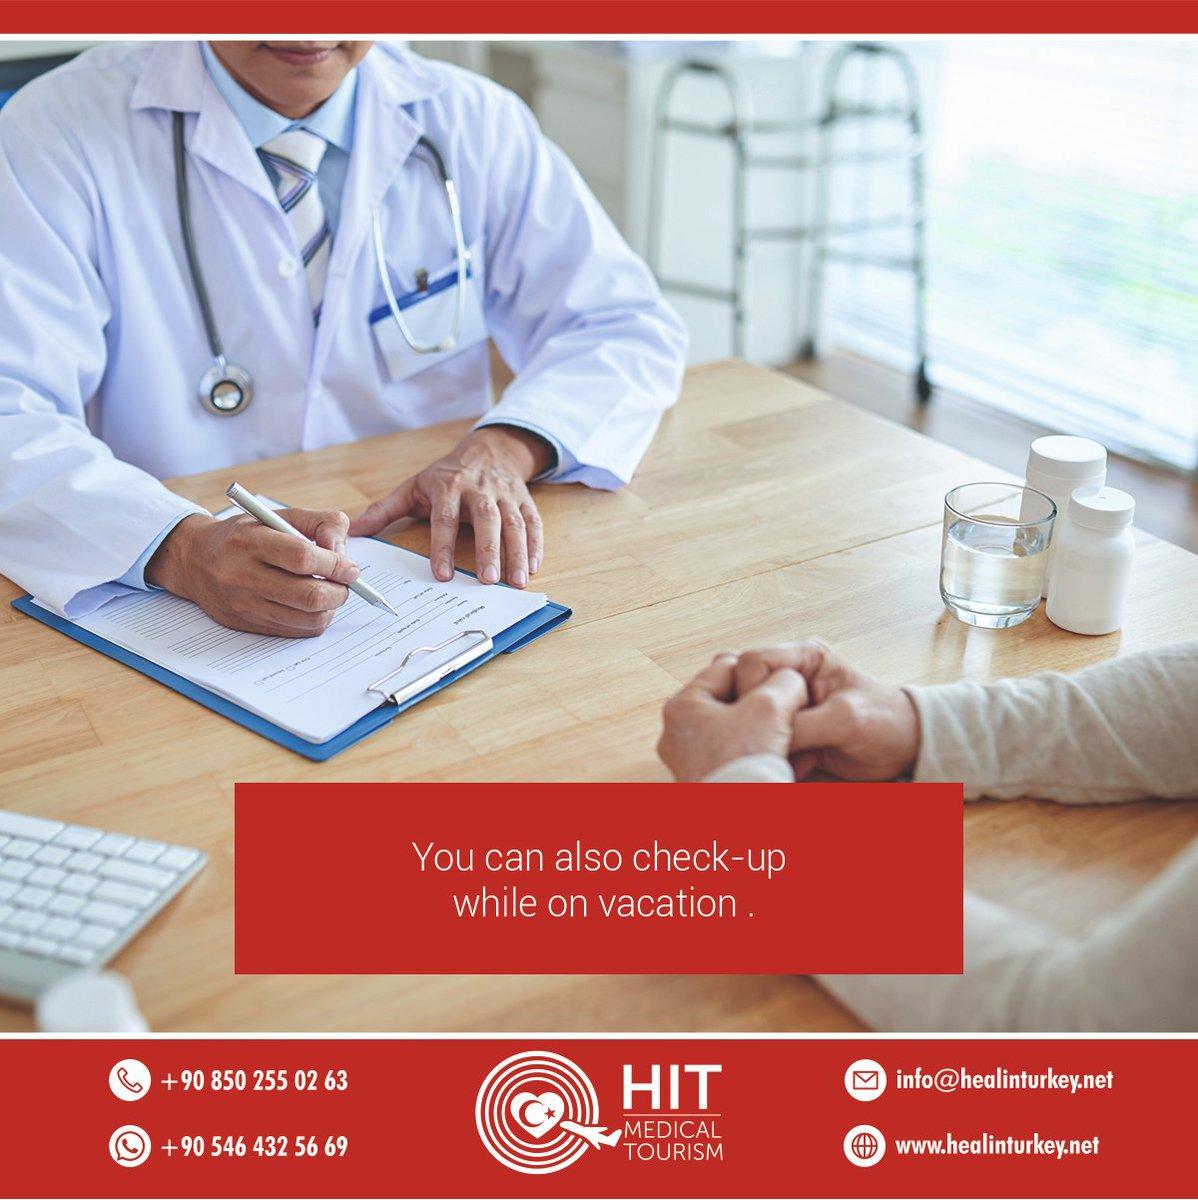 You can also check-up while on vacation .  #turkey #visitturkey #healthtourismturkey #turkeytravel #hairtransplant #cancercare #plasticsurgery #aestheticsurgery #nosejob #obesitysurgery #orthopedics #gammaknife #dentalturkey #implantturkey #dsd #digitalsmiledesign pic.twitter.com/jxDAipuokD